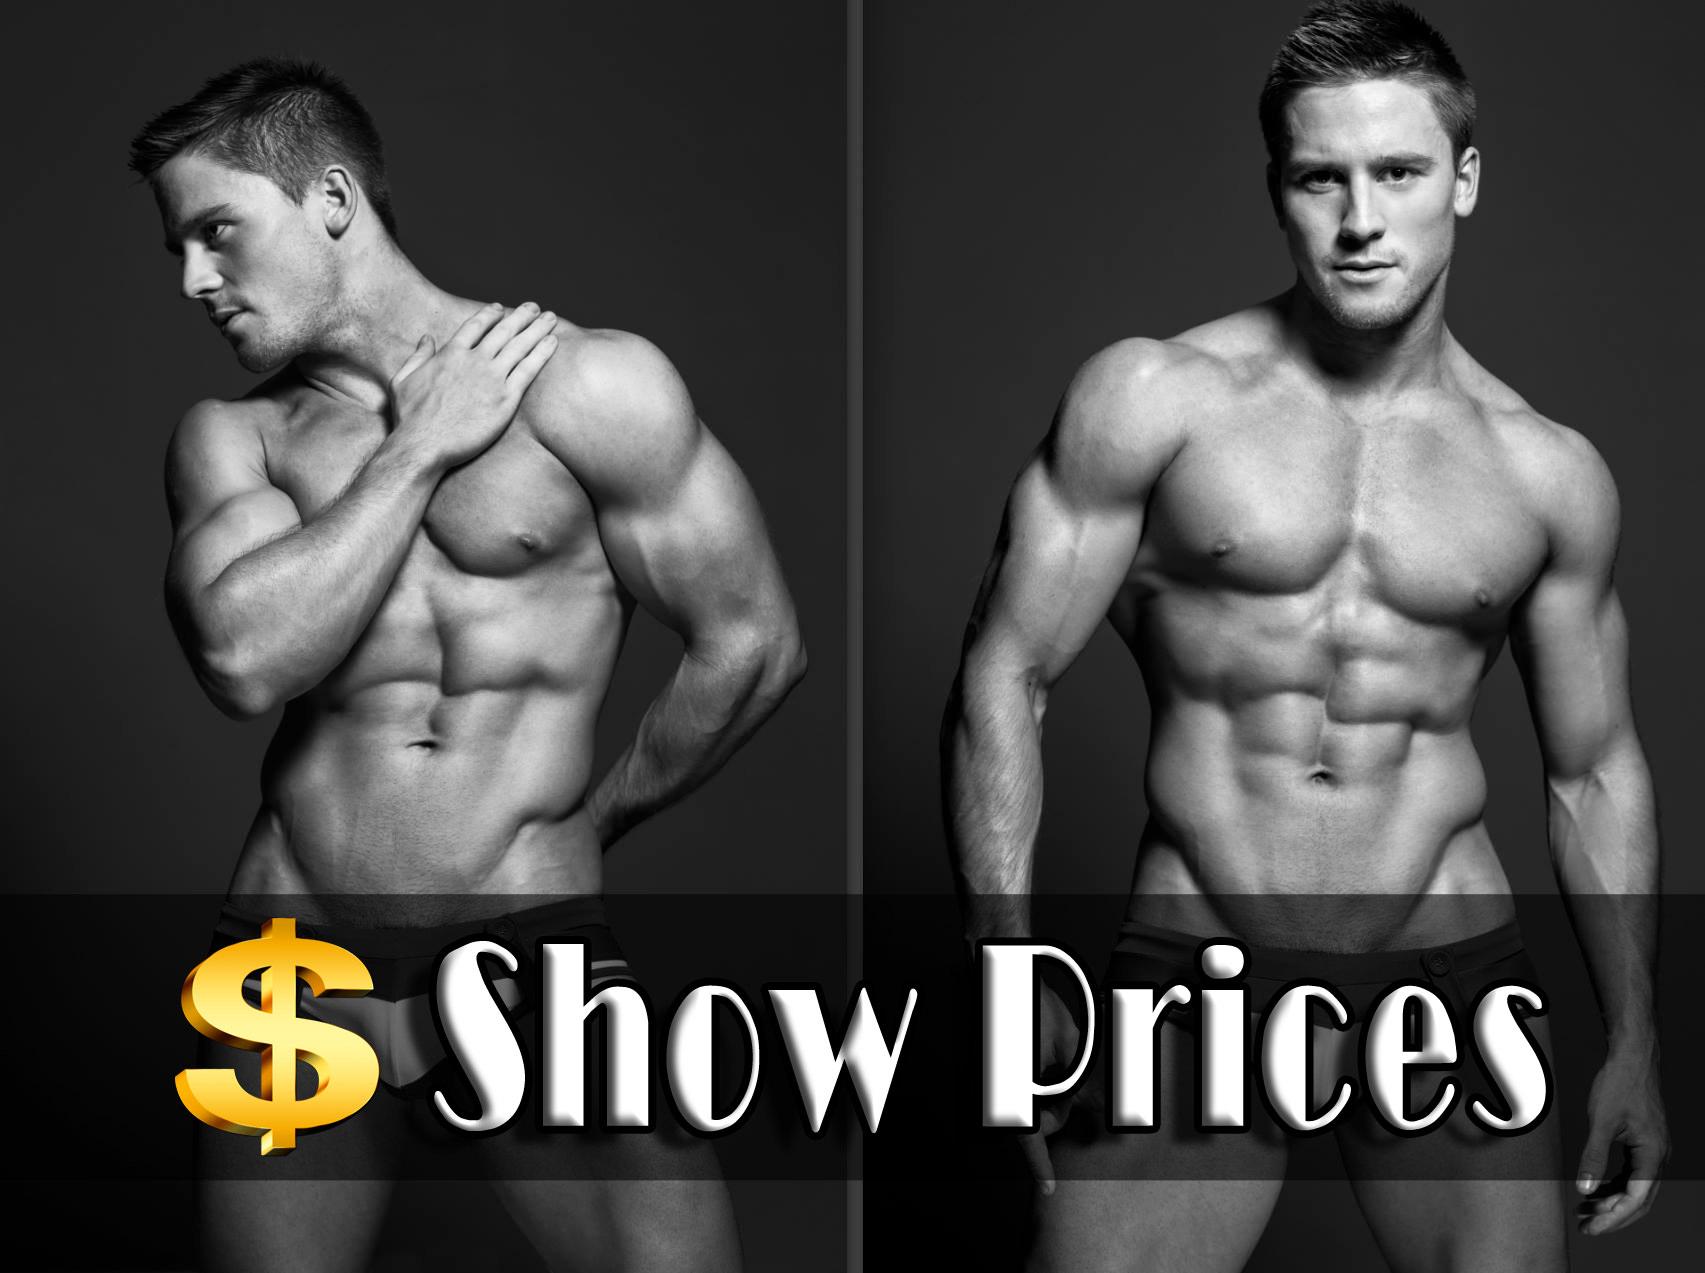 brisbane male strip show prices